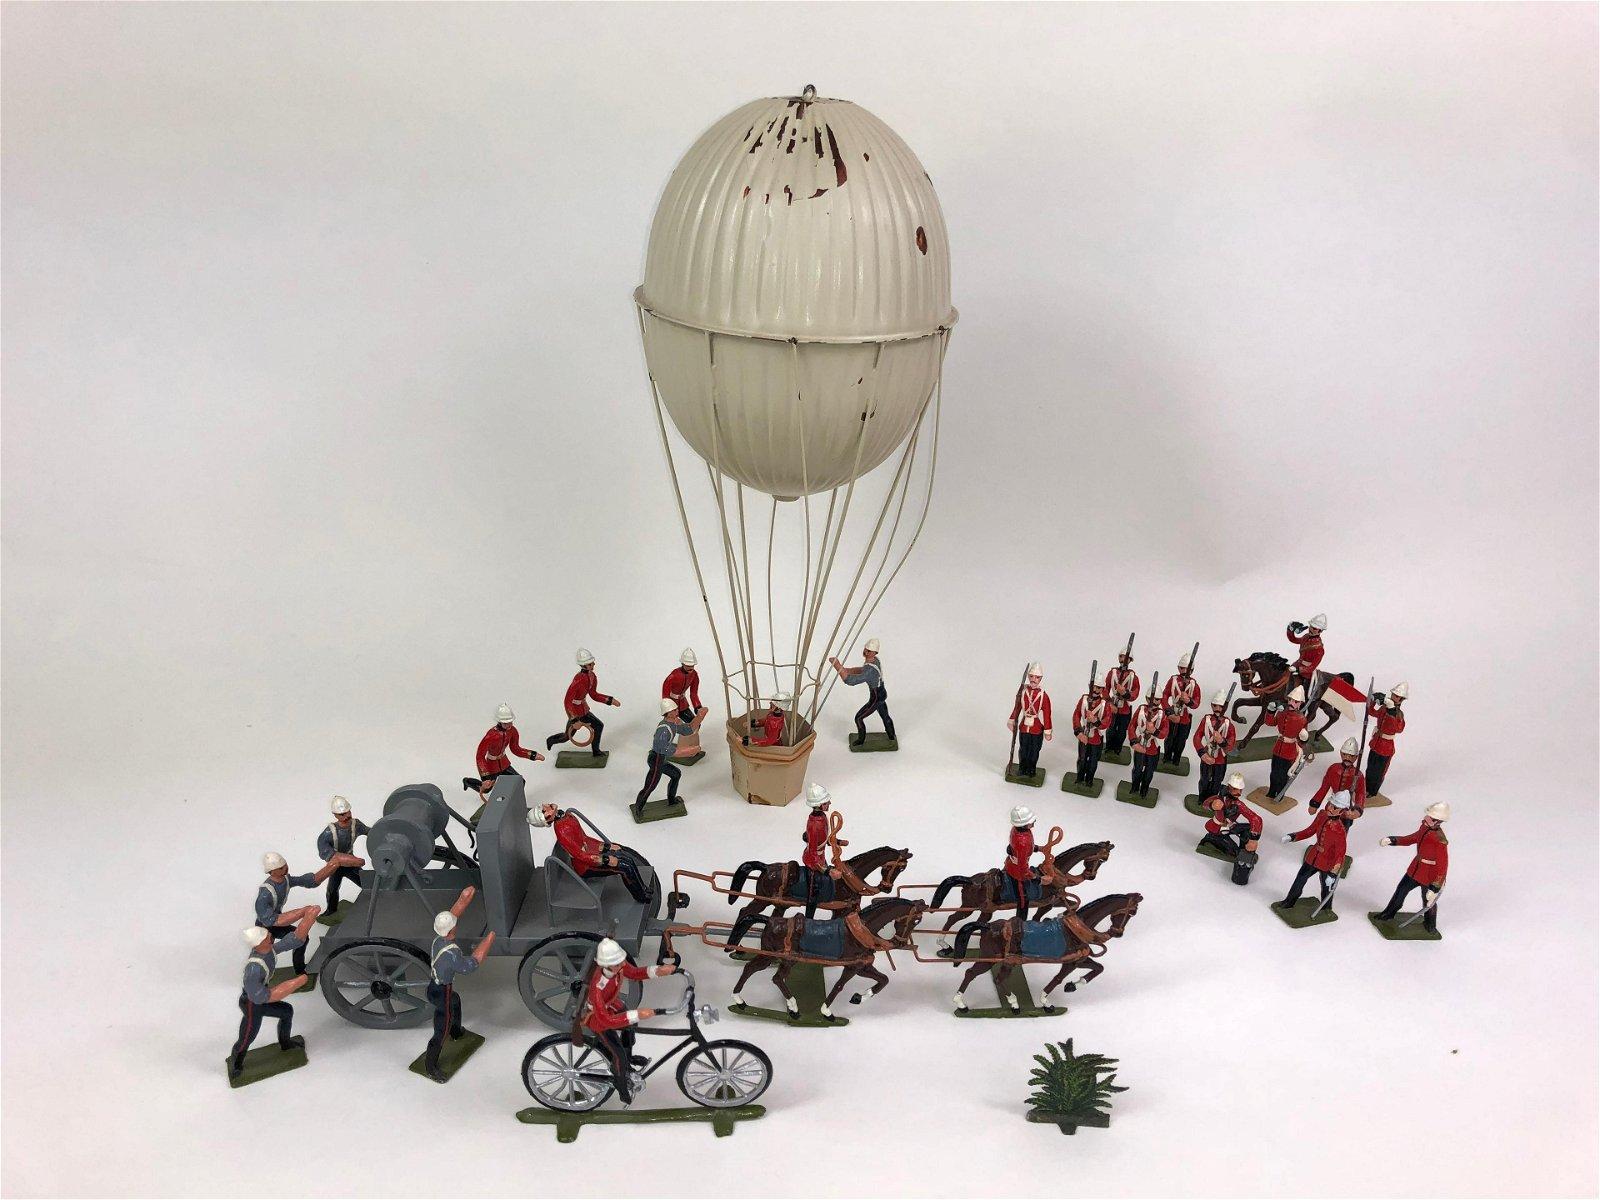 Potsdamer Zinnsoldaten Observation Balloon